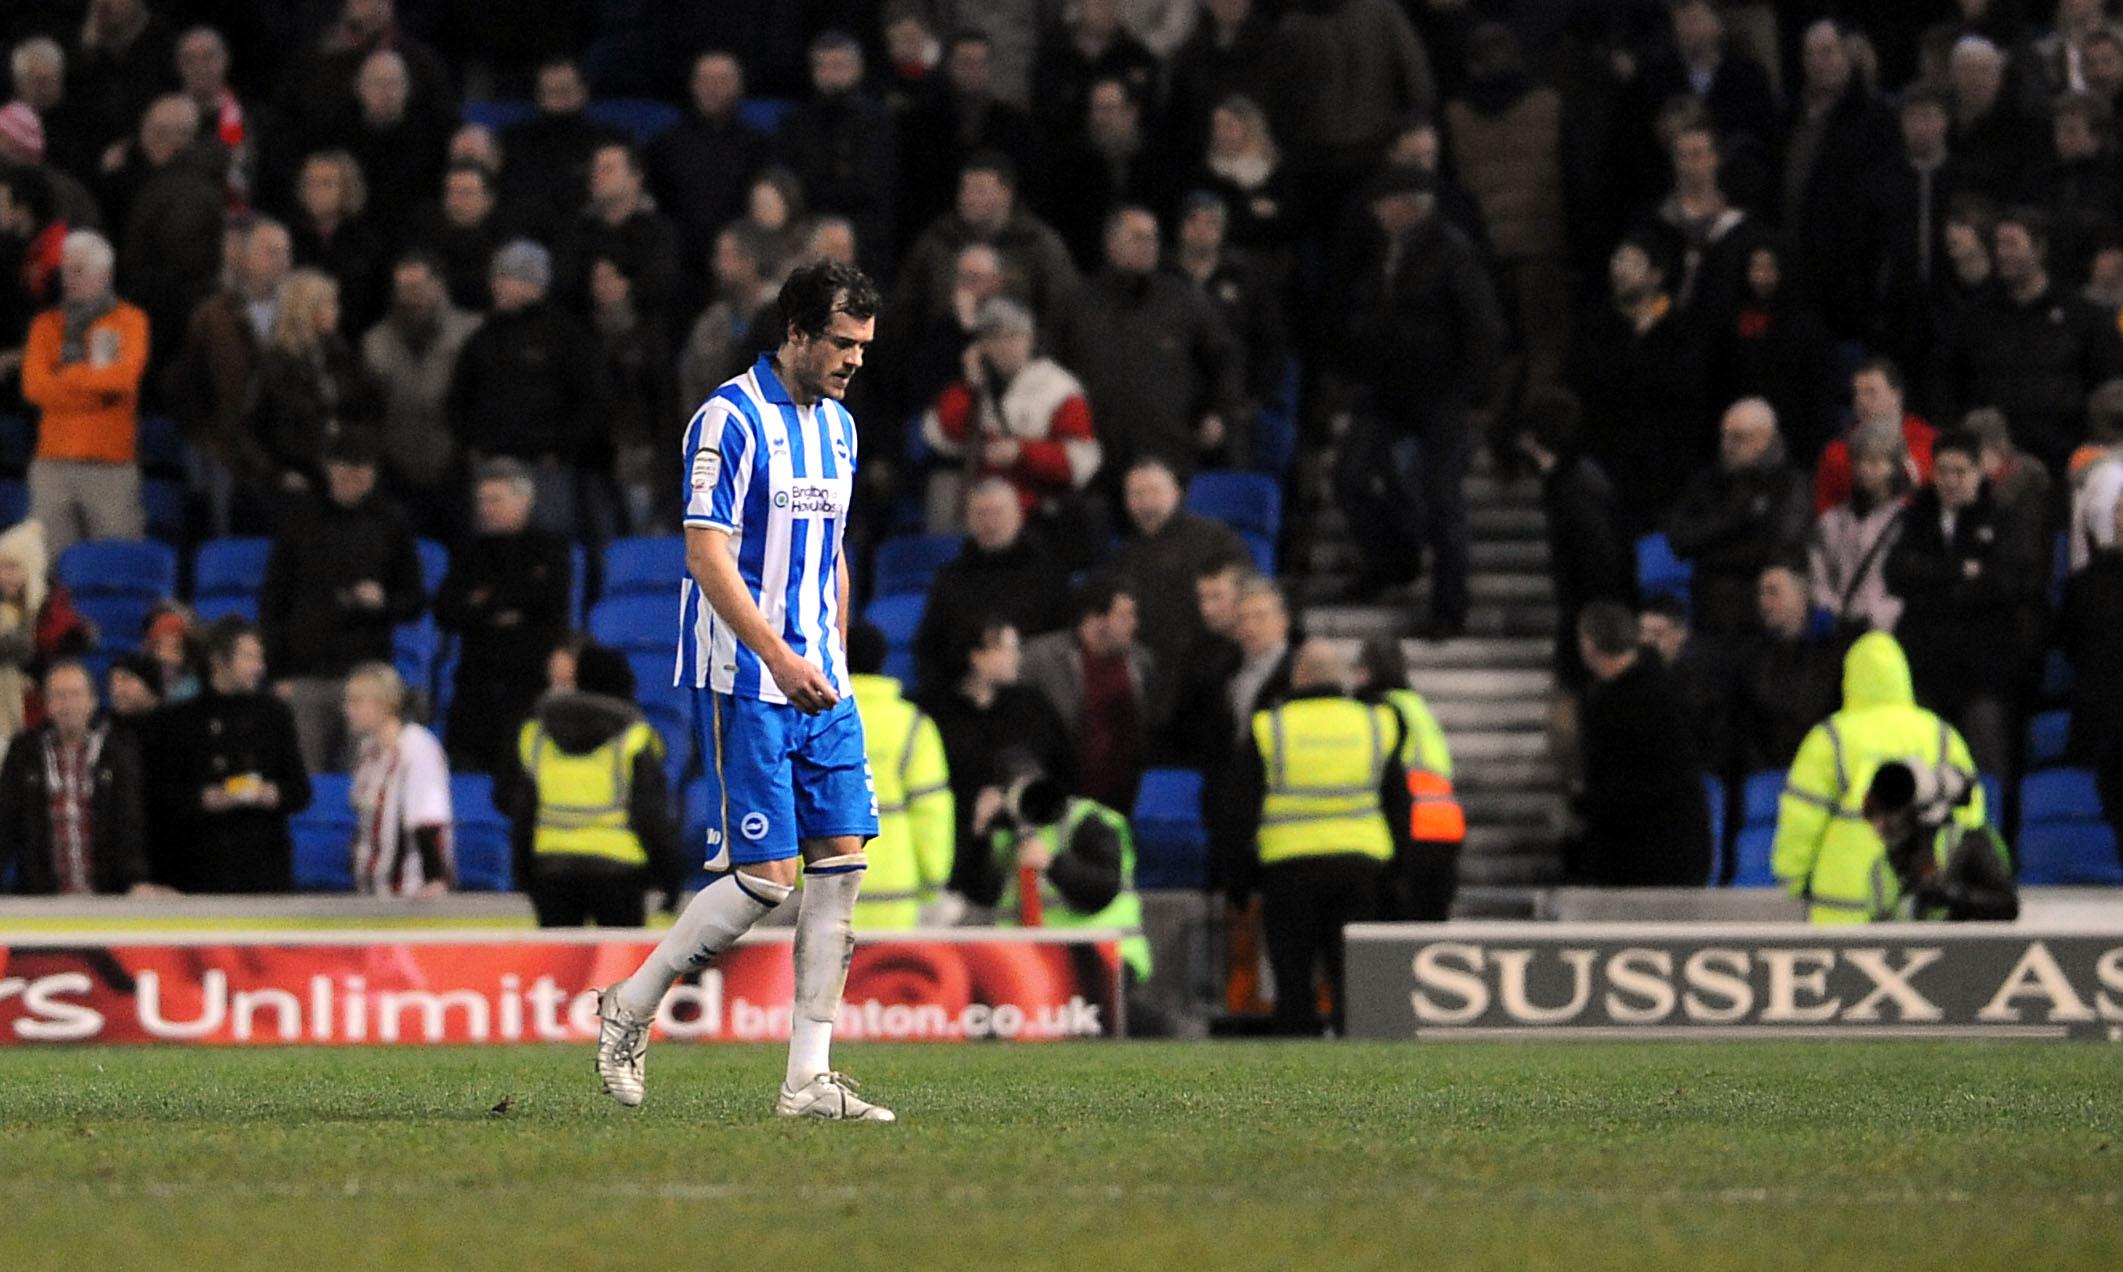 Gordon Greer recalls his memories of Albion's last win over Southampton